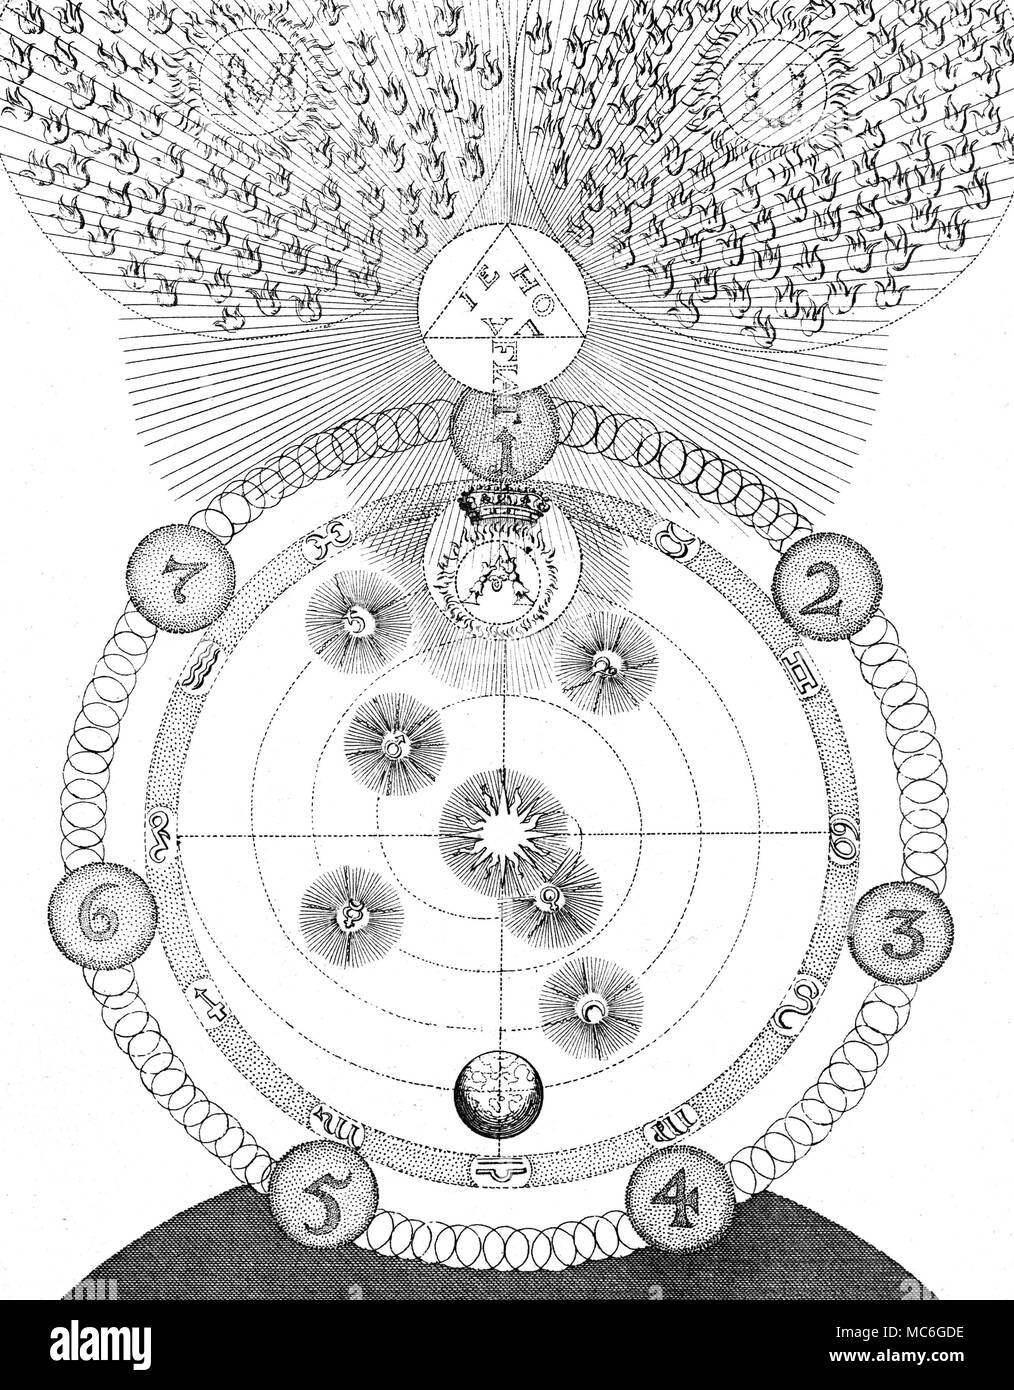 Occult Diagram Art Auto Electrical Wiring Diagram